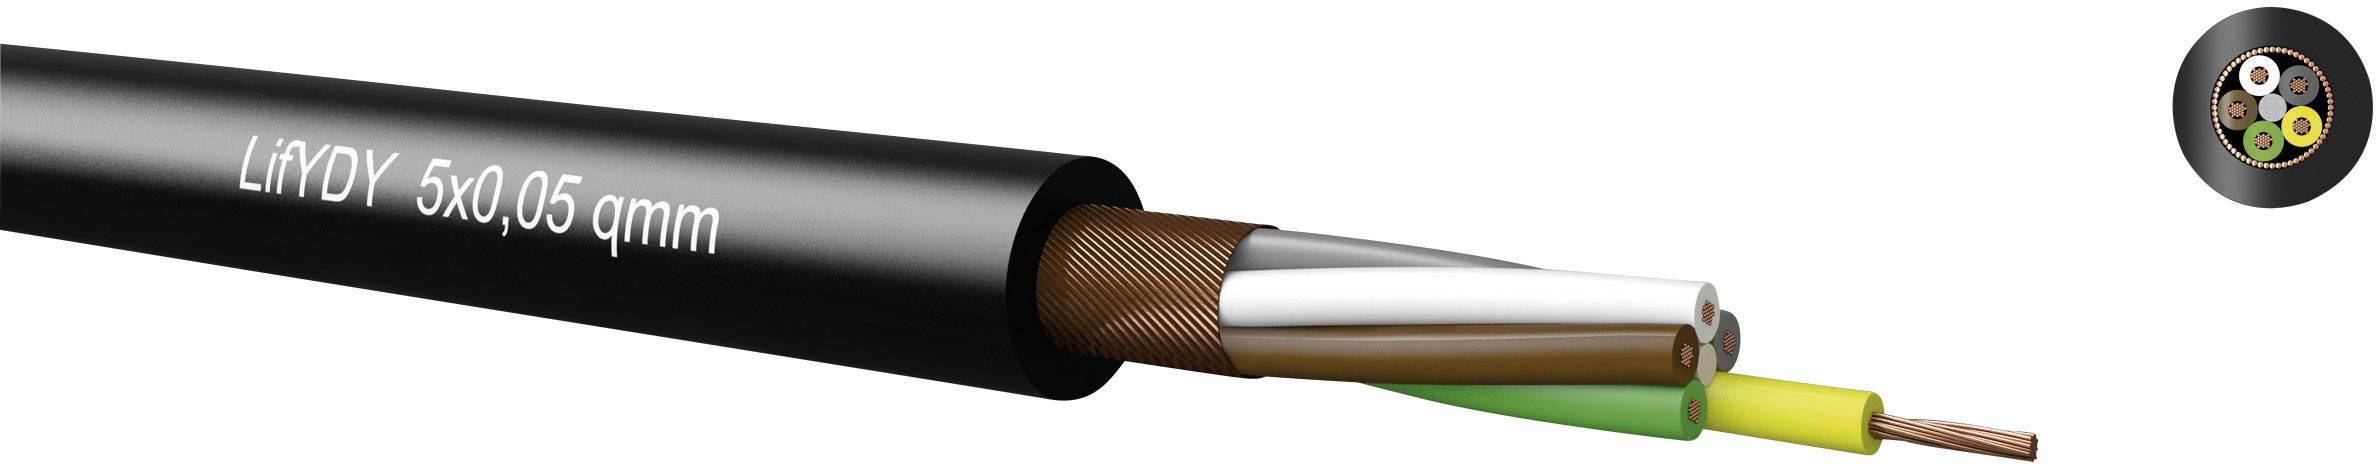 Riadiaci kábel Kabeltronik LifYDY 340200500, 2 x 0.05 mm², vonkajší Ø 2.70 mm, 100 V, metrový tovar, čierna